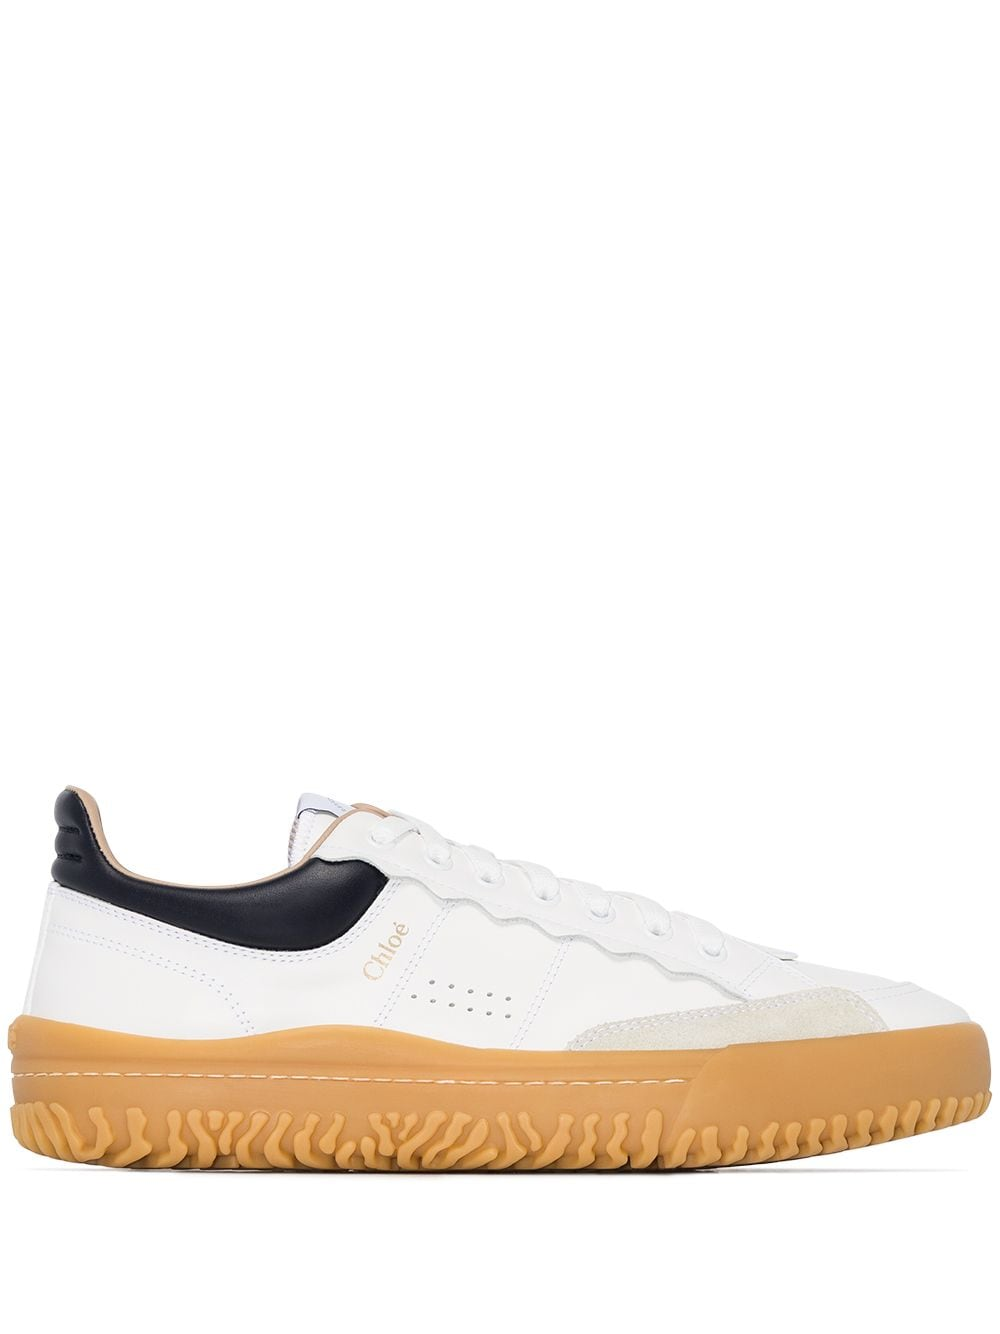 Franckie Leather Sneakers